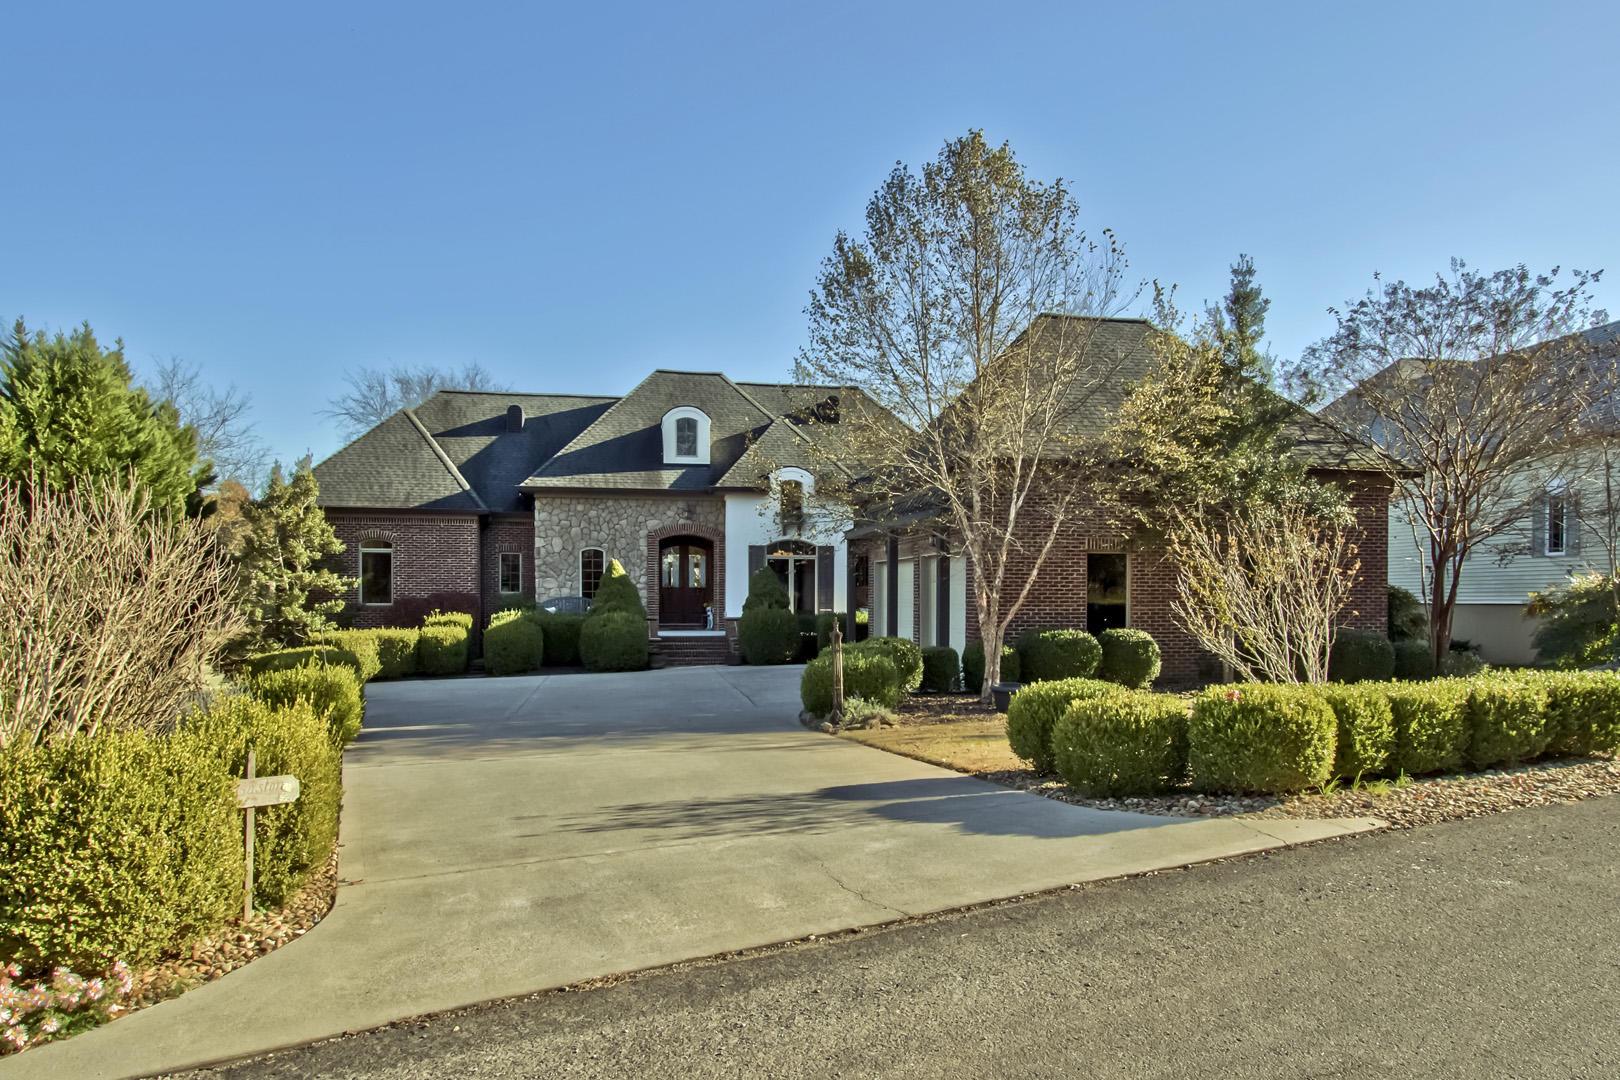 105 Nunnehi Tr, Vonore, Tennessee 37885, 3 Bedrooms Bedrooms, ,2 BathroomsBathrooms,Single Family,For Sale,Nunnehi,1100953